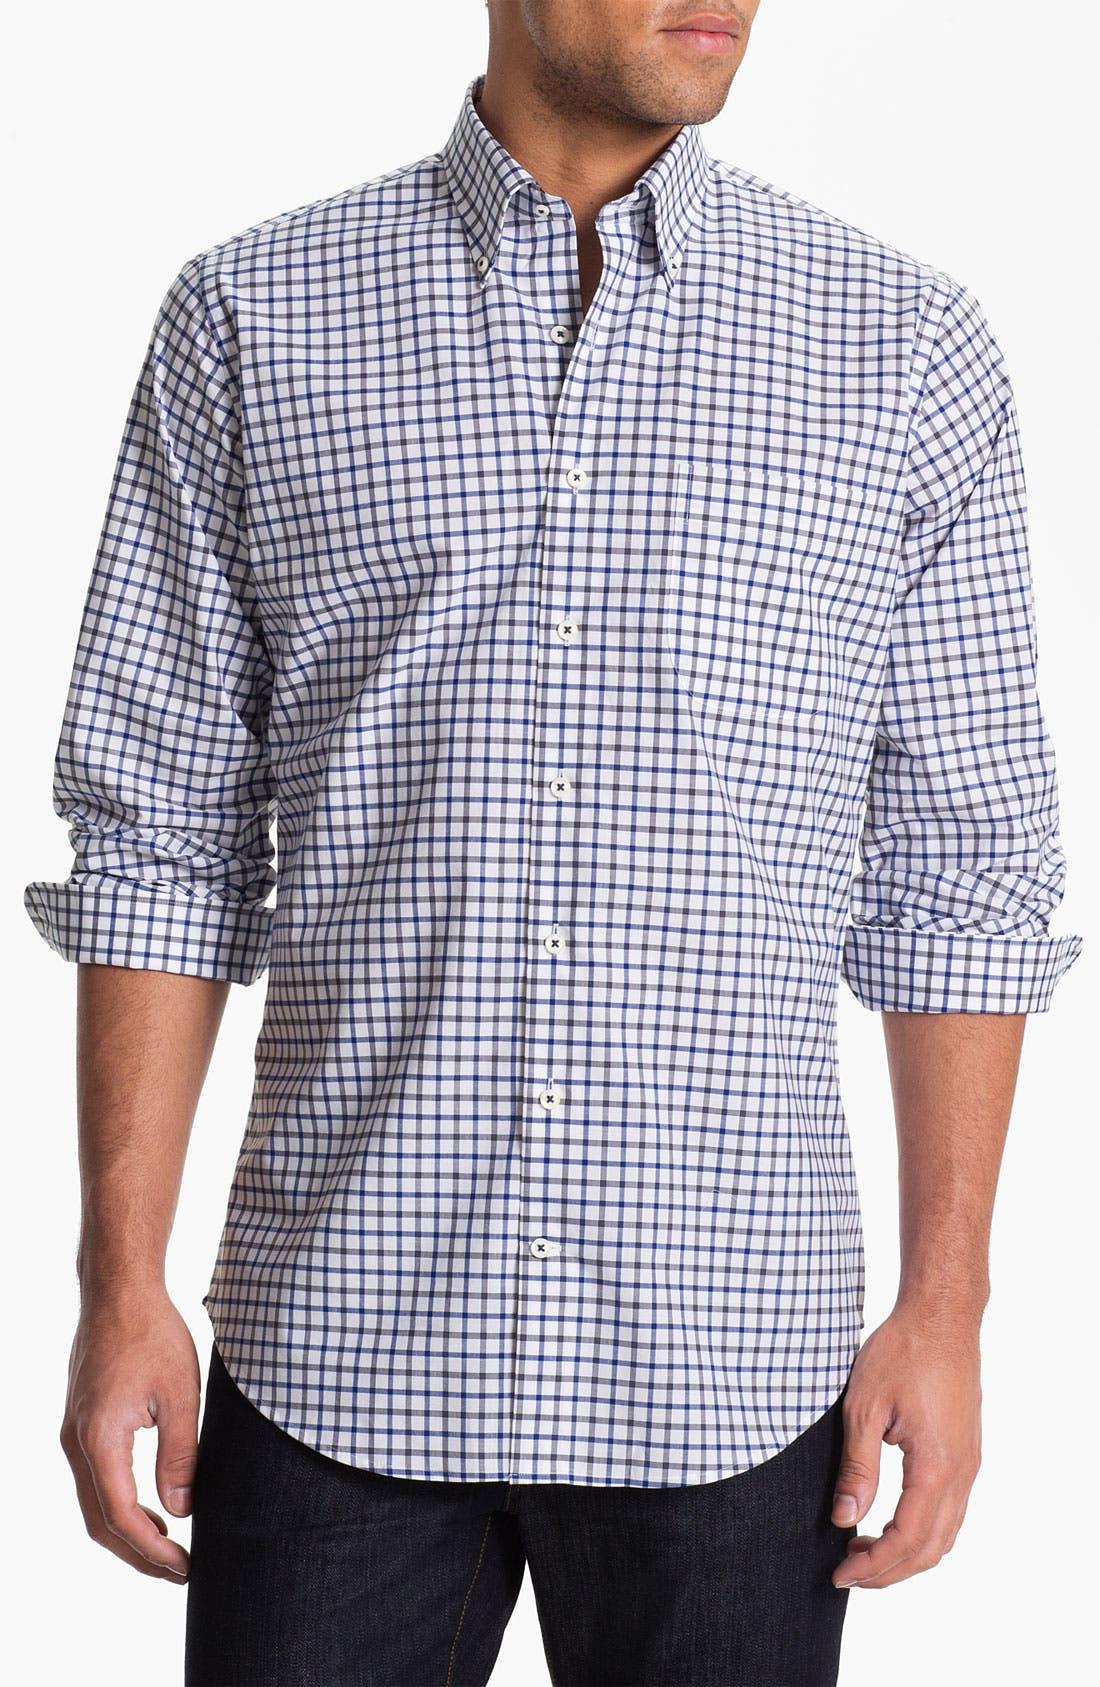 Alternate Image 1 Selected - Peter Millar 'Athens' Regular Fit Sport Shirt